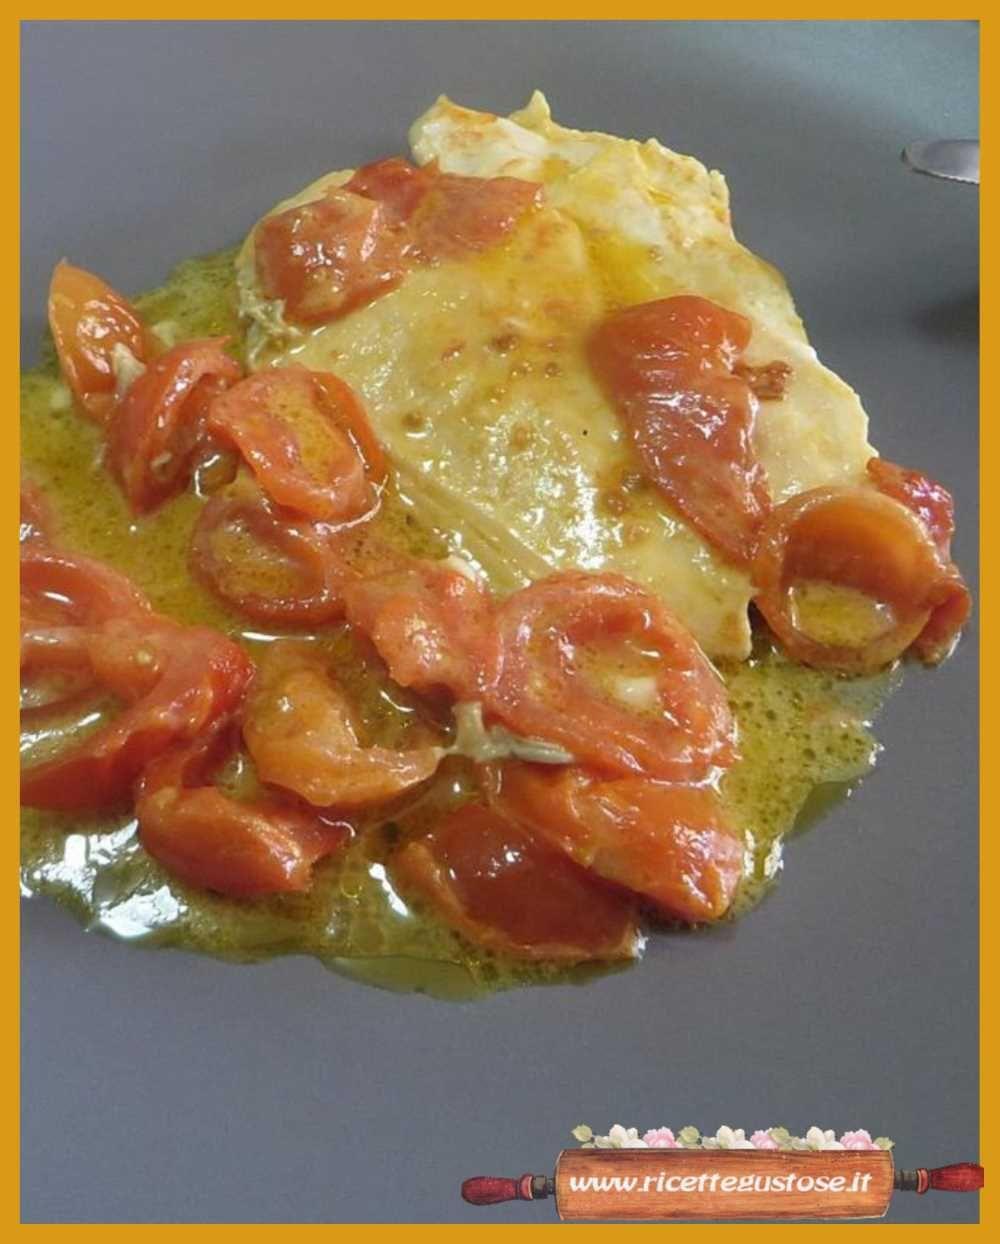 d9fc40bdb5f3e24a58a549f87f26299c - Ricette Con Petti Di Pollo